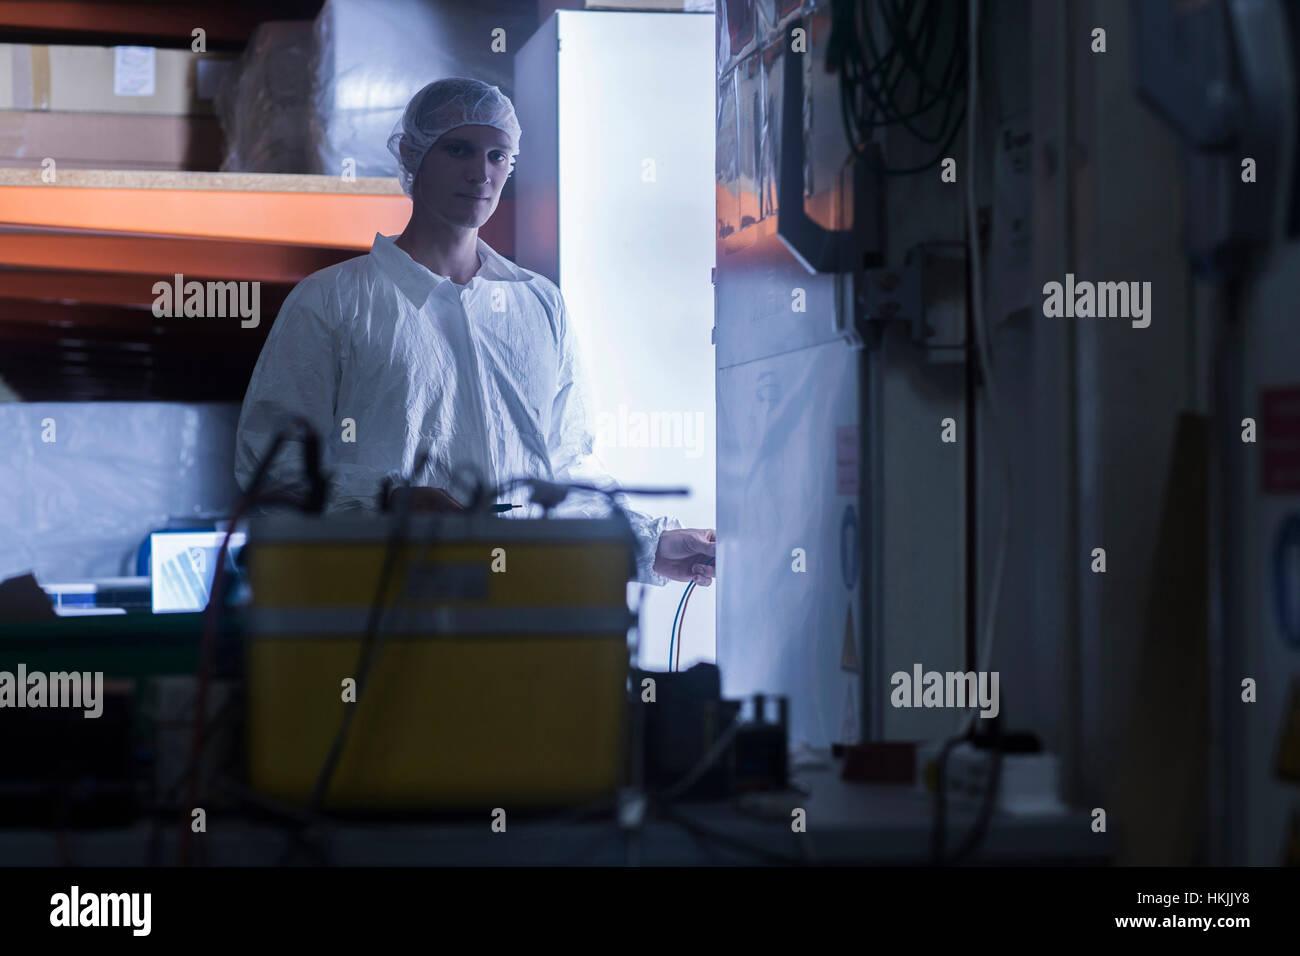 Clean room worker working in warehouse, Freiburg im Breisgau, Baden-Württemberg, Germany - Stock Image